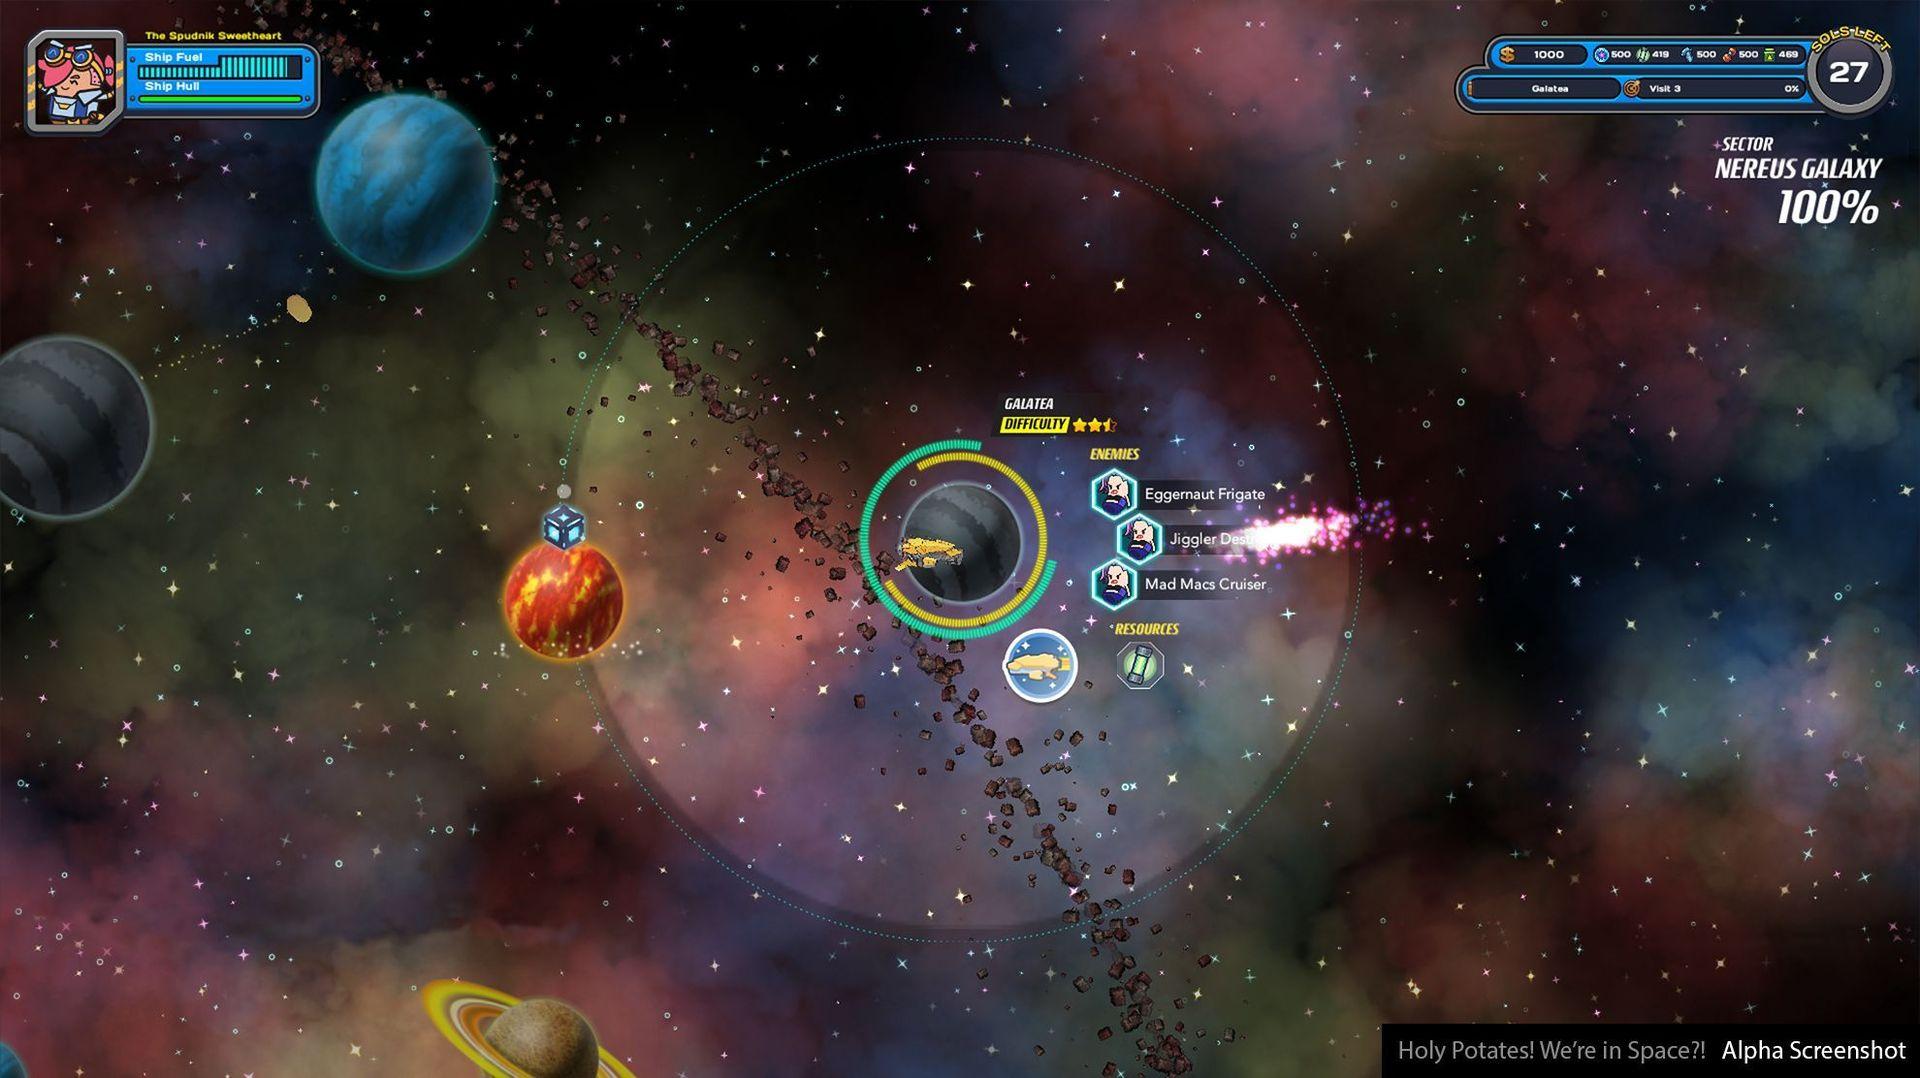 union-cosmos-holy-potatoes-were-in-space-espacio